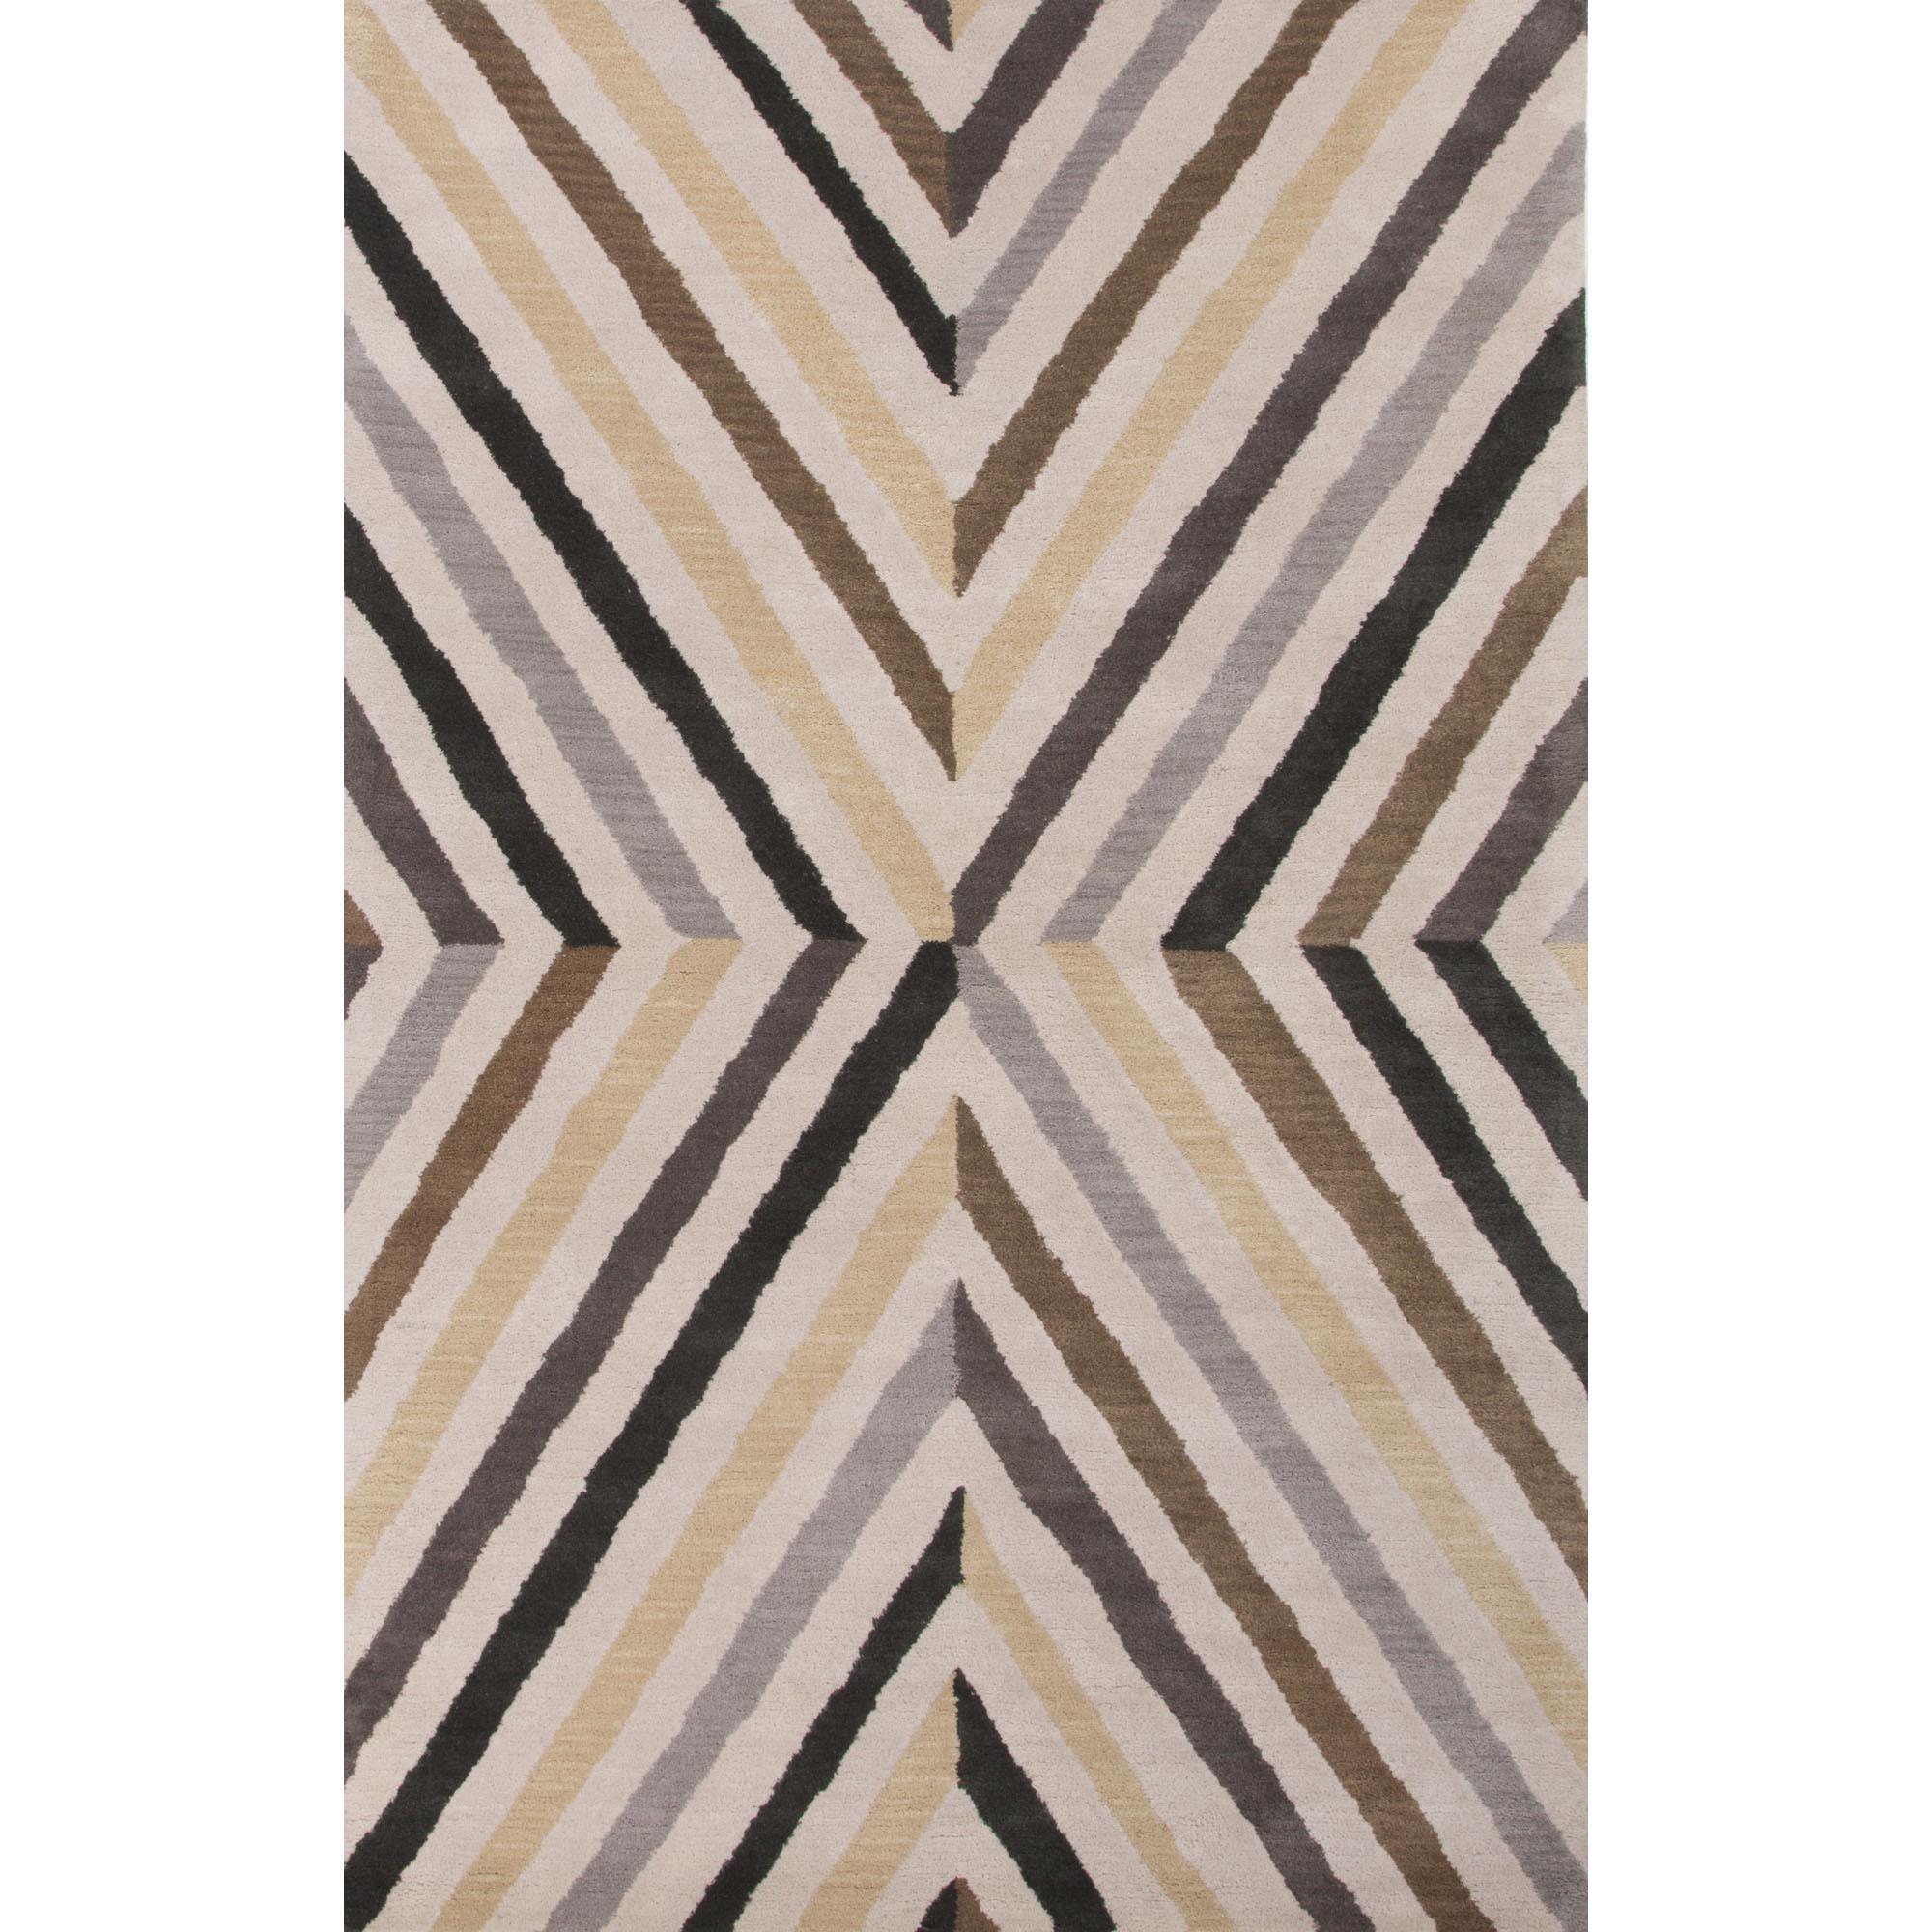 JAIPUR Rugs En Casa By Luli Sanchez Tufted 5 x 8 Rug - Item Number: RUG115646